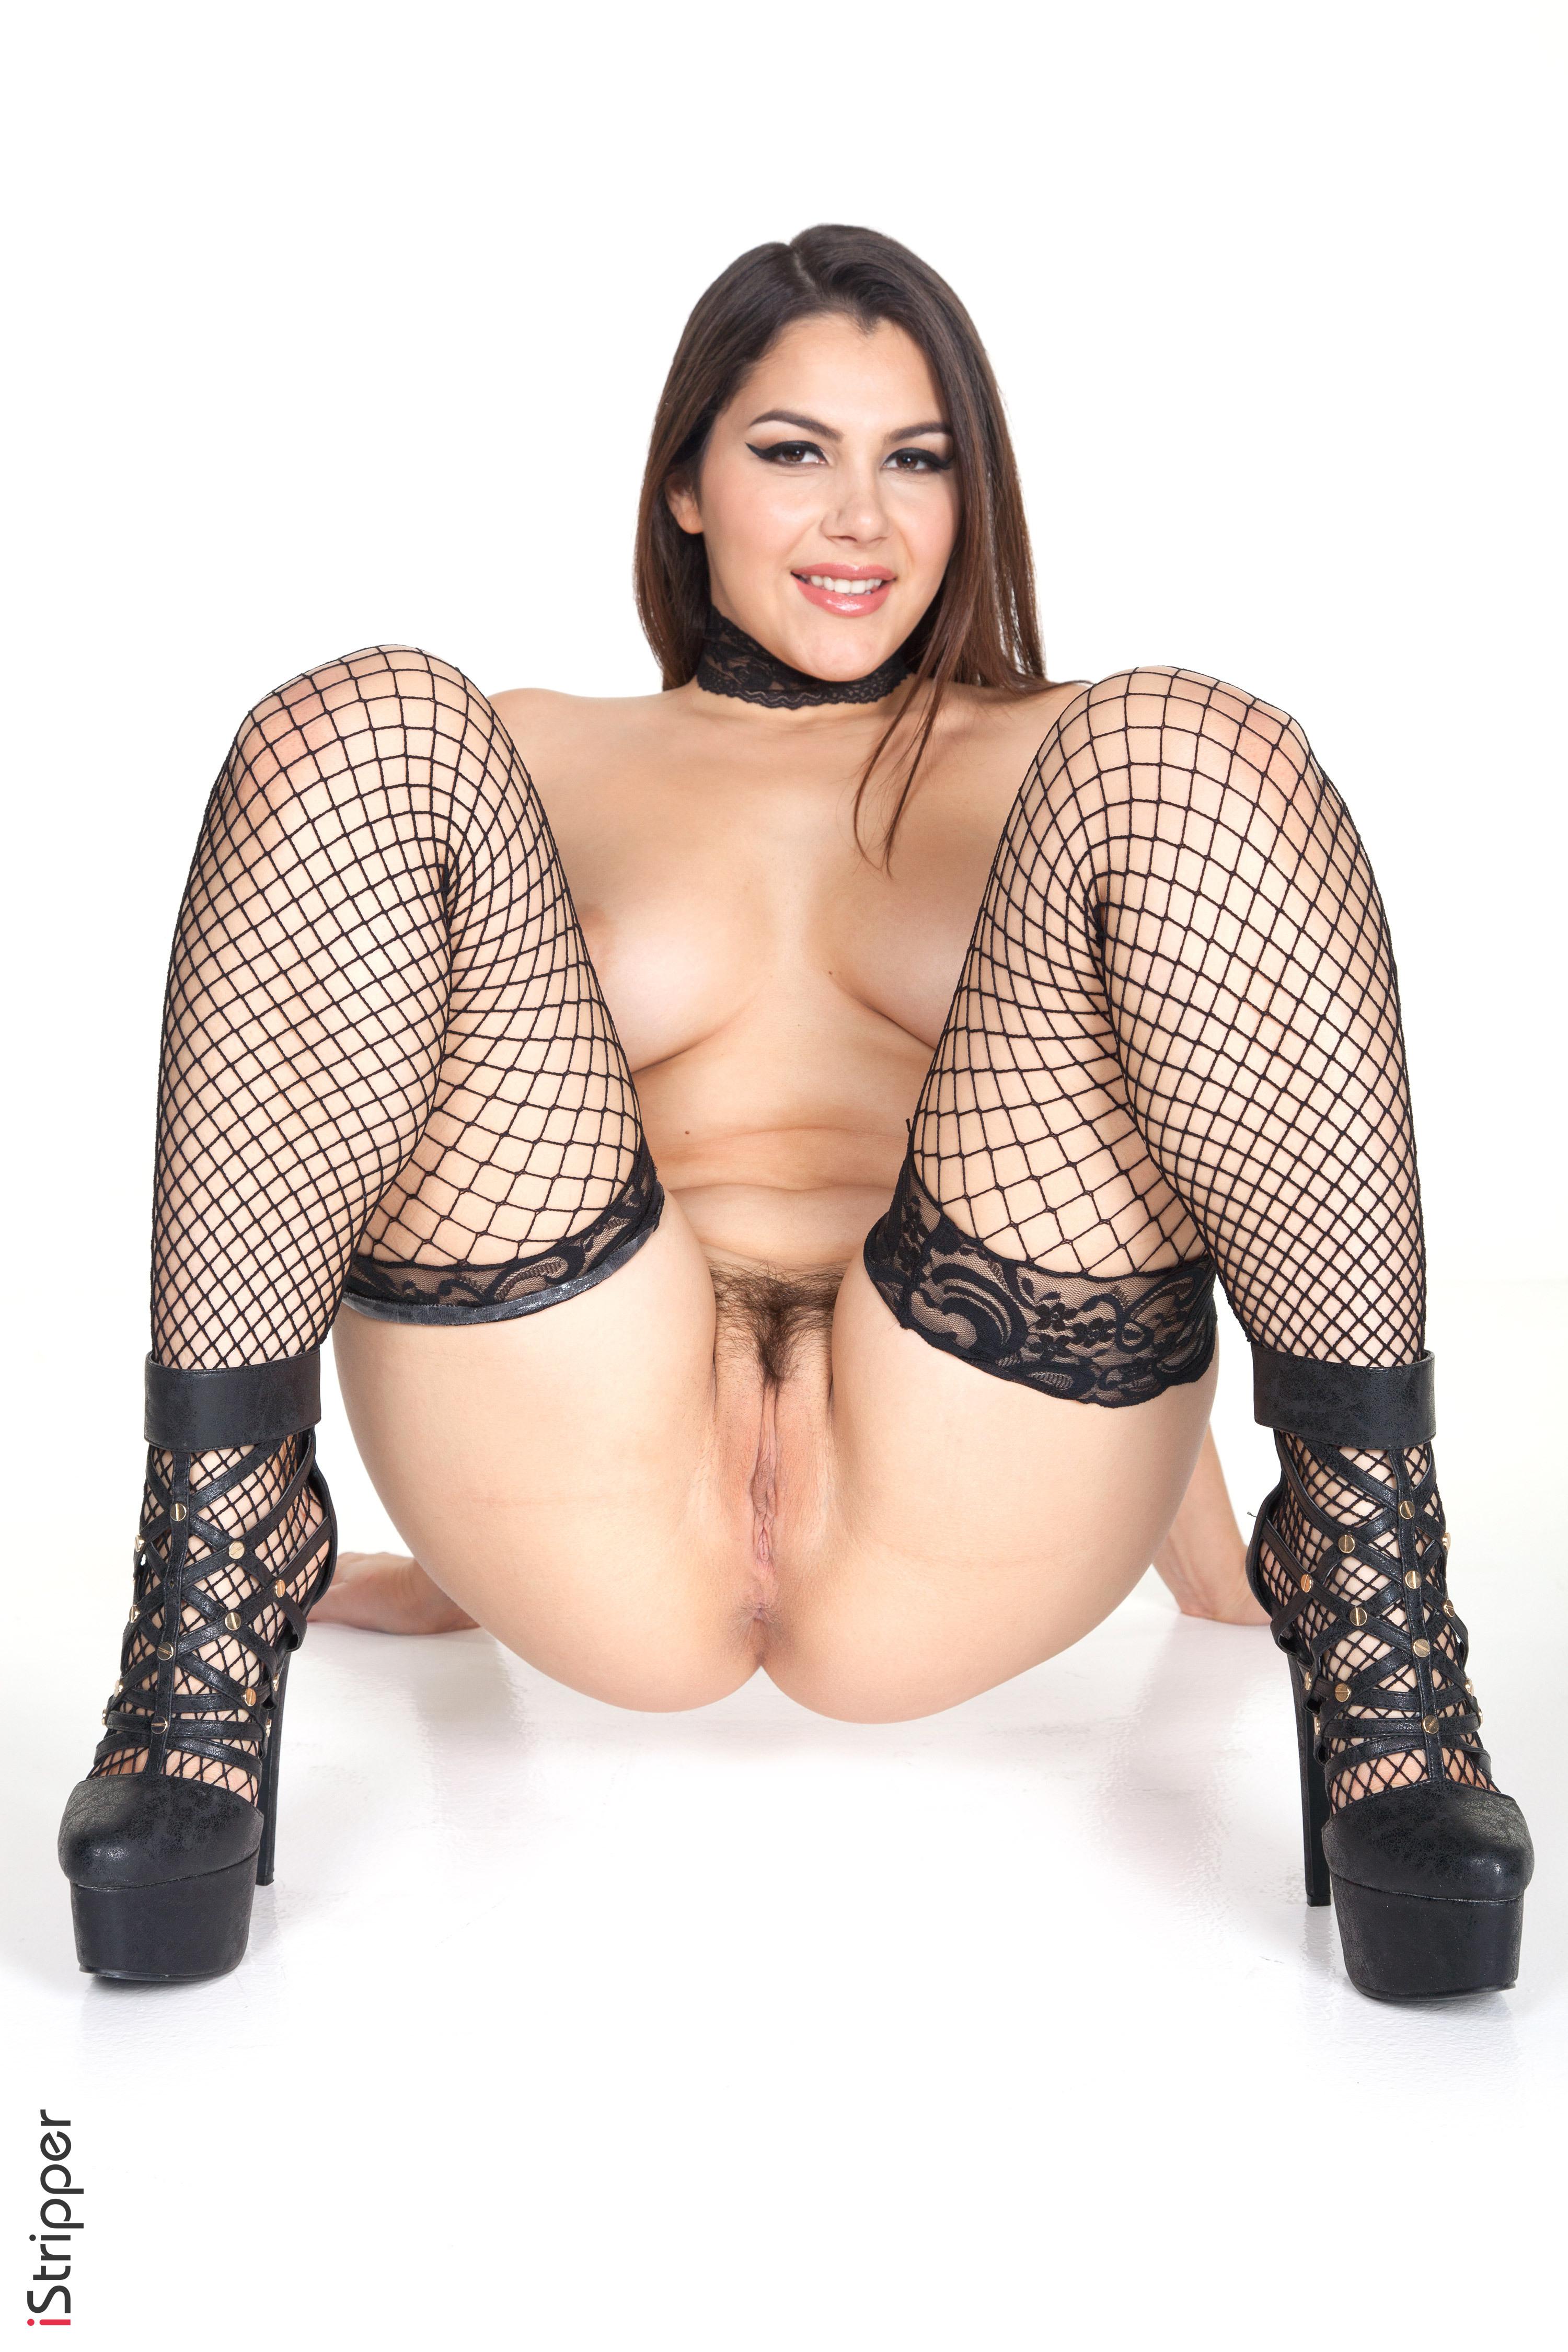 hot girls stripping videos